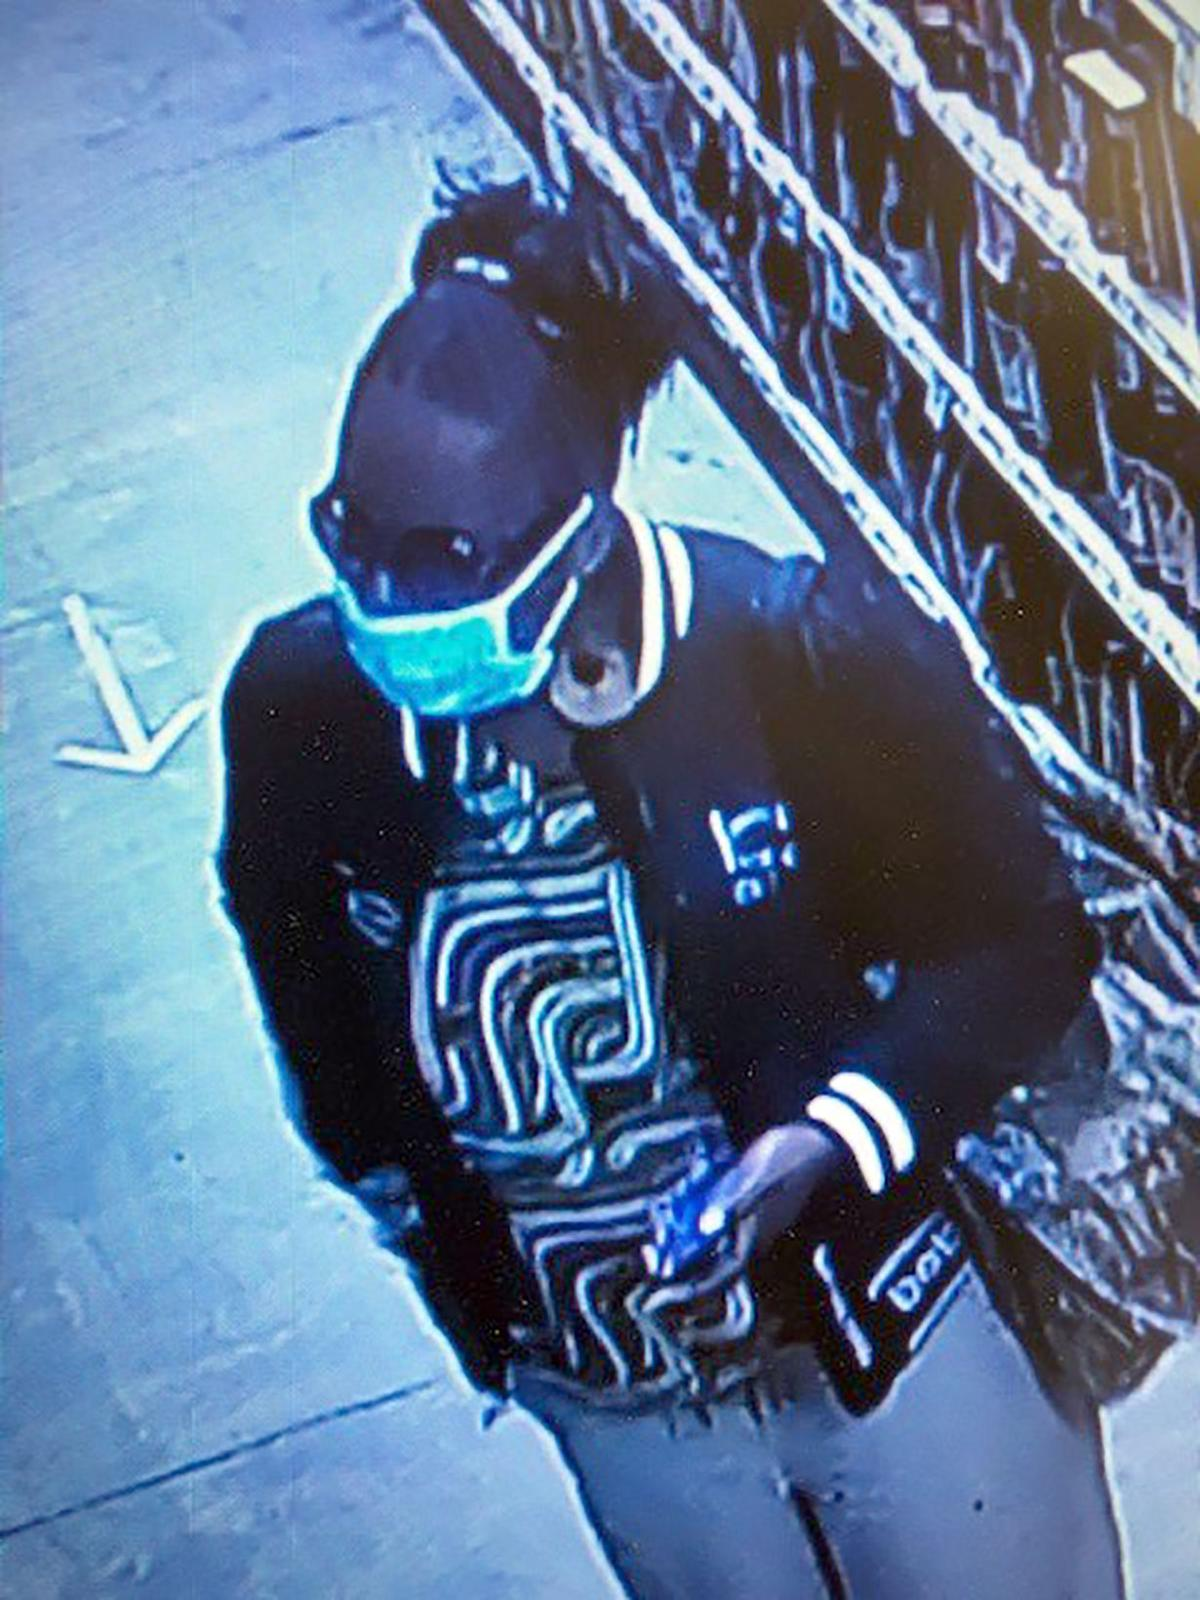 Watertown Police Seek Suspect in Liquor Store Shoplifting